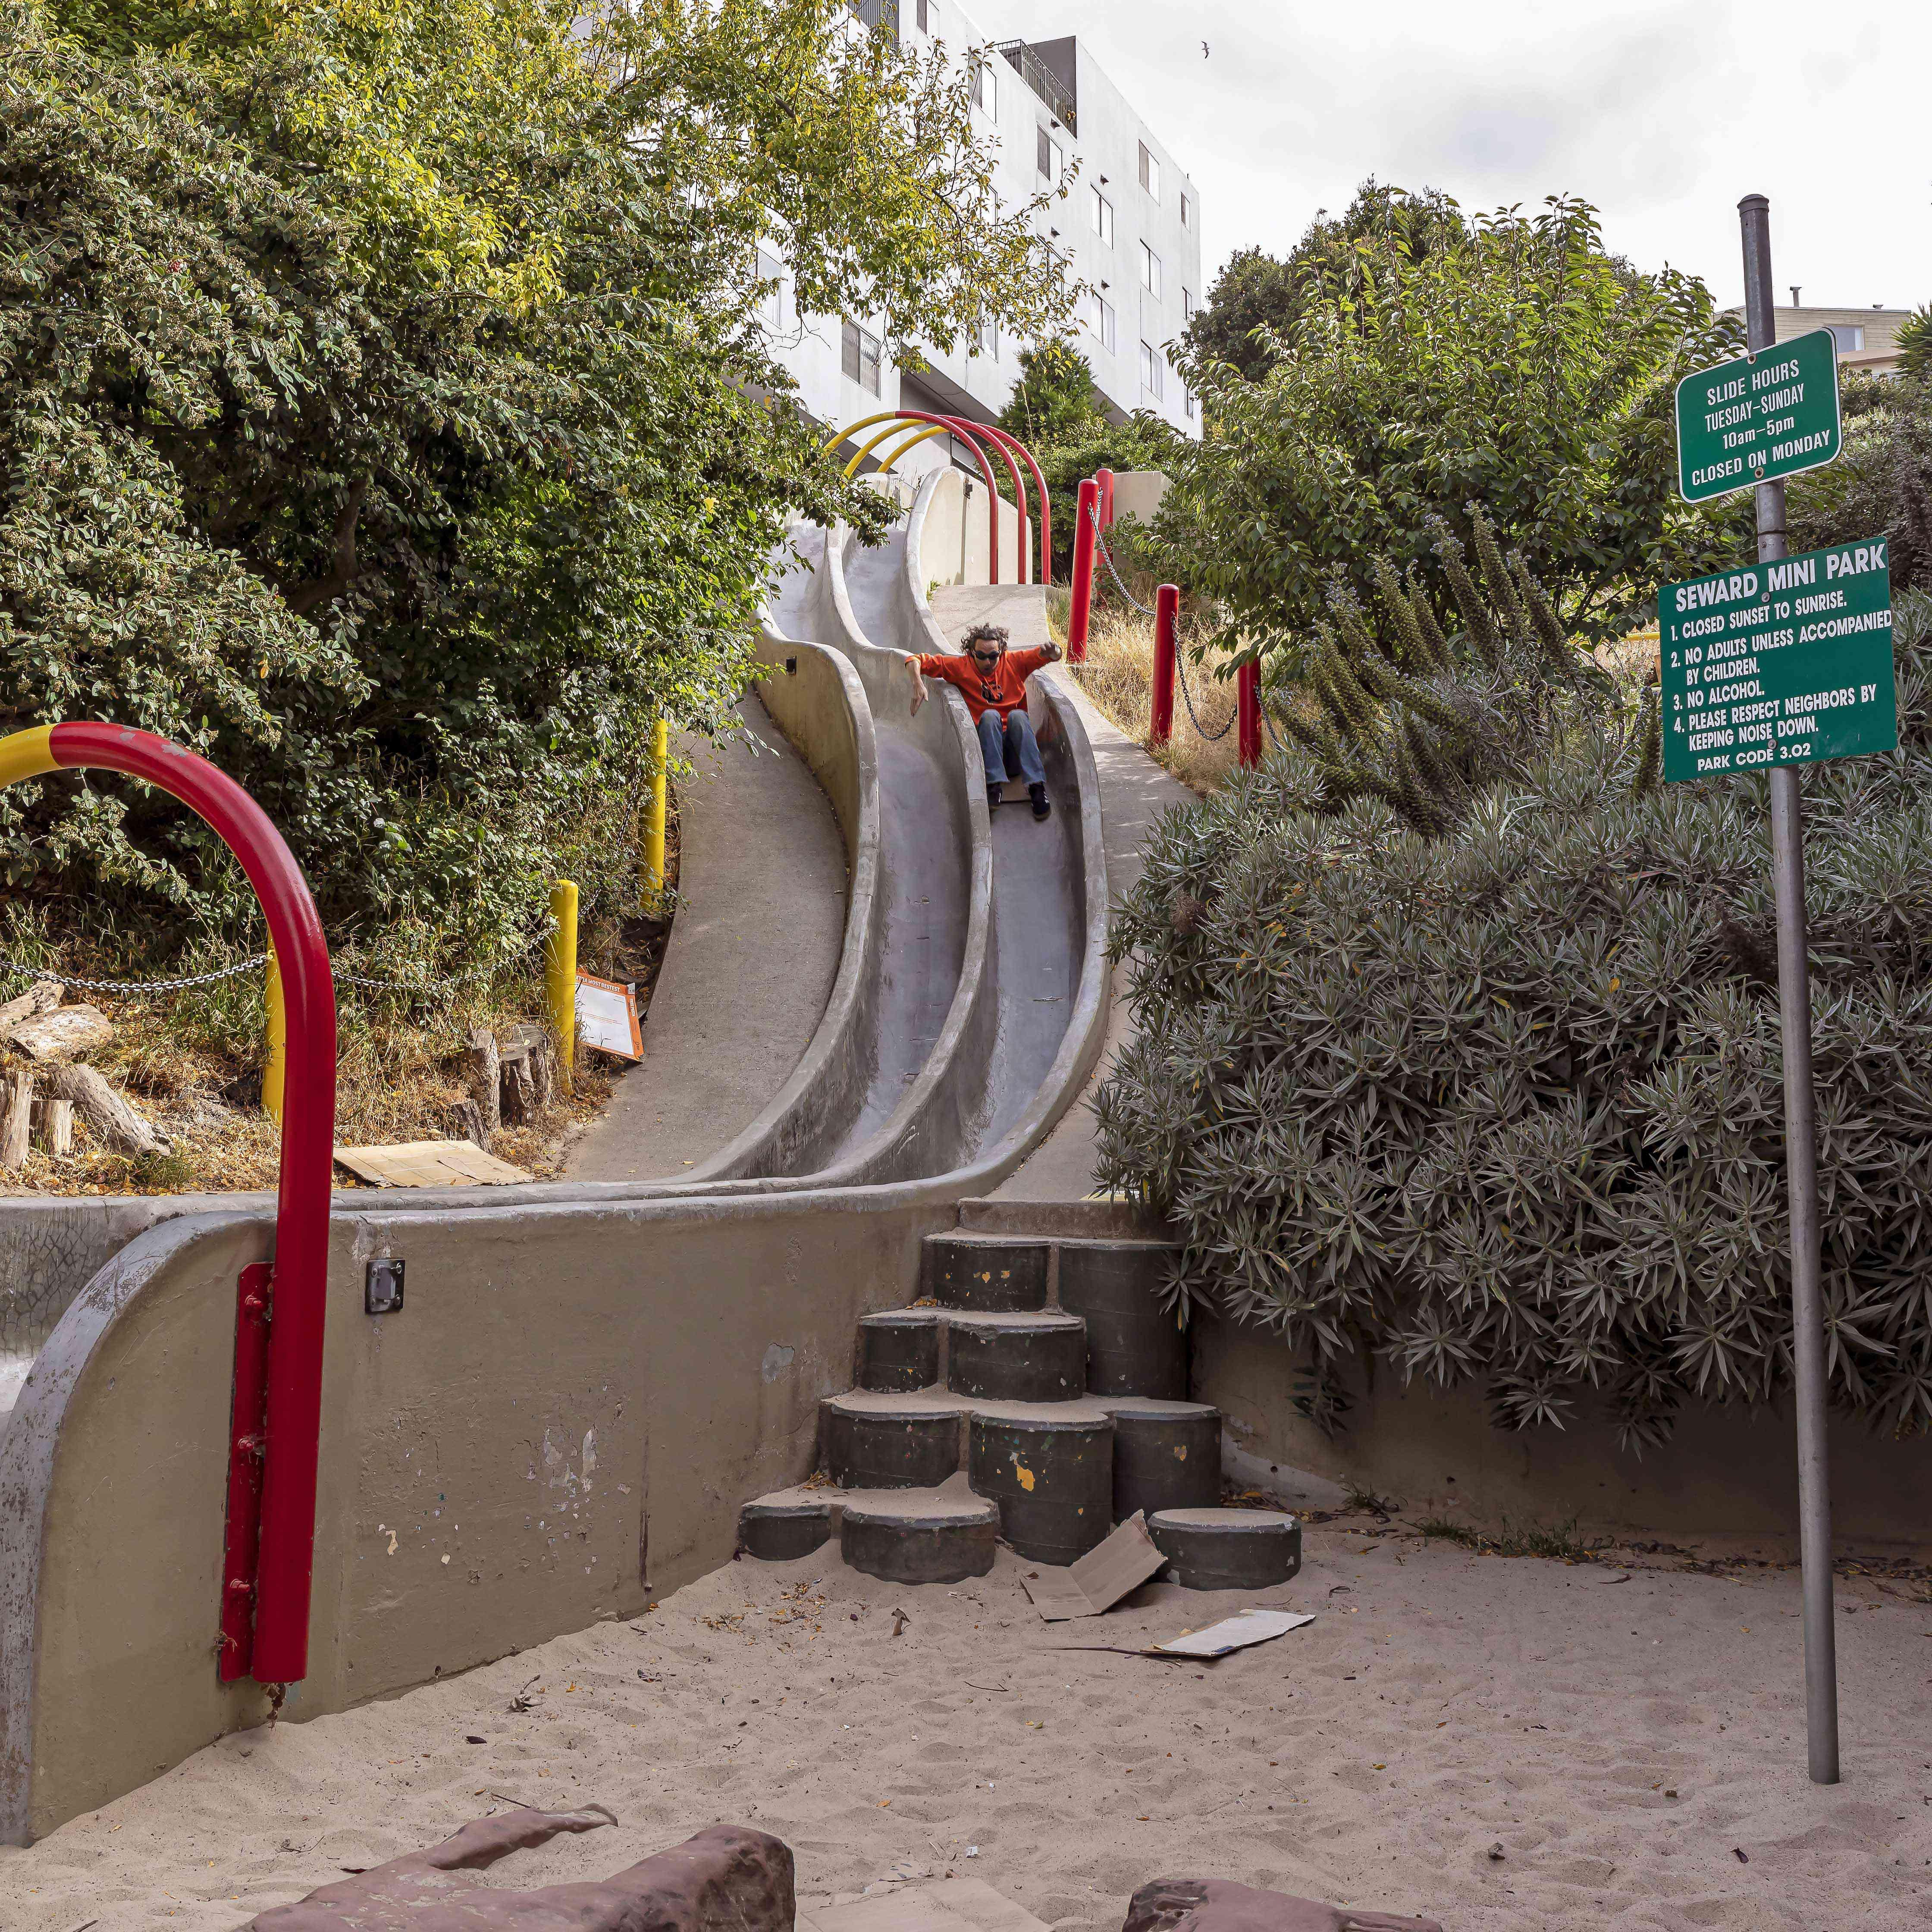 Seward Street Slides, San Francisco